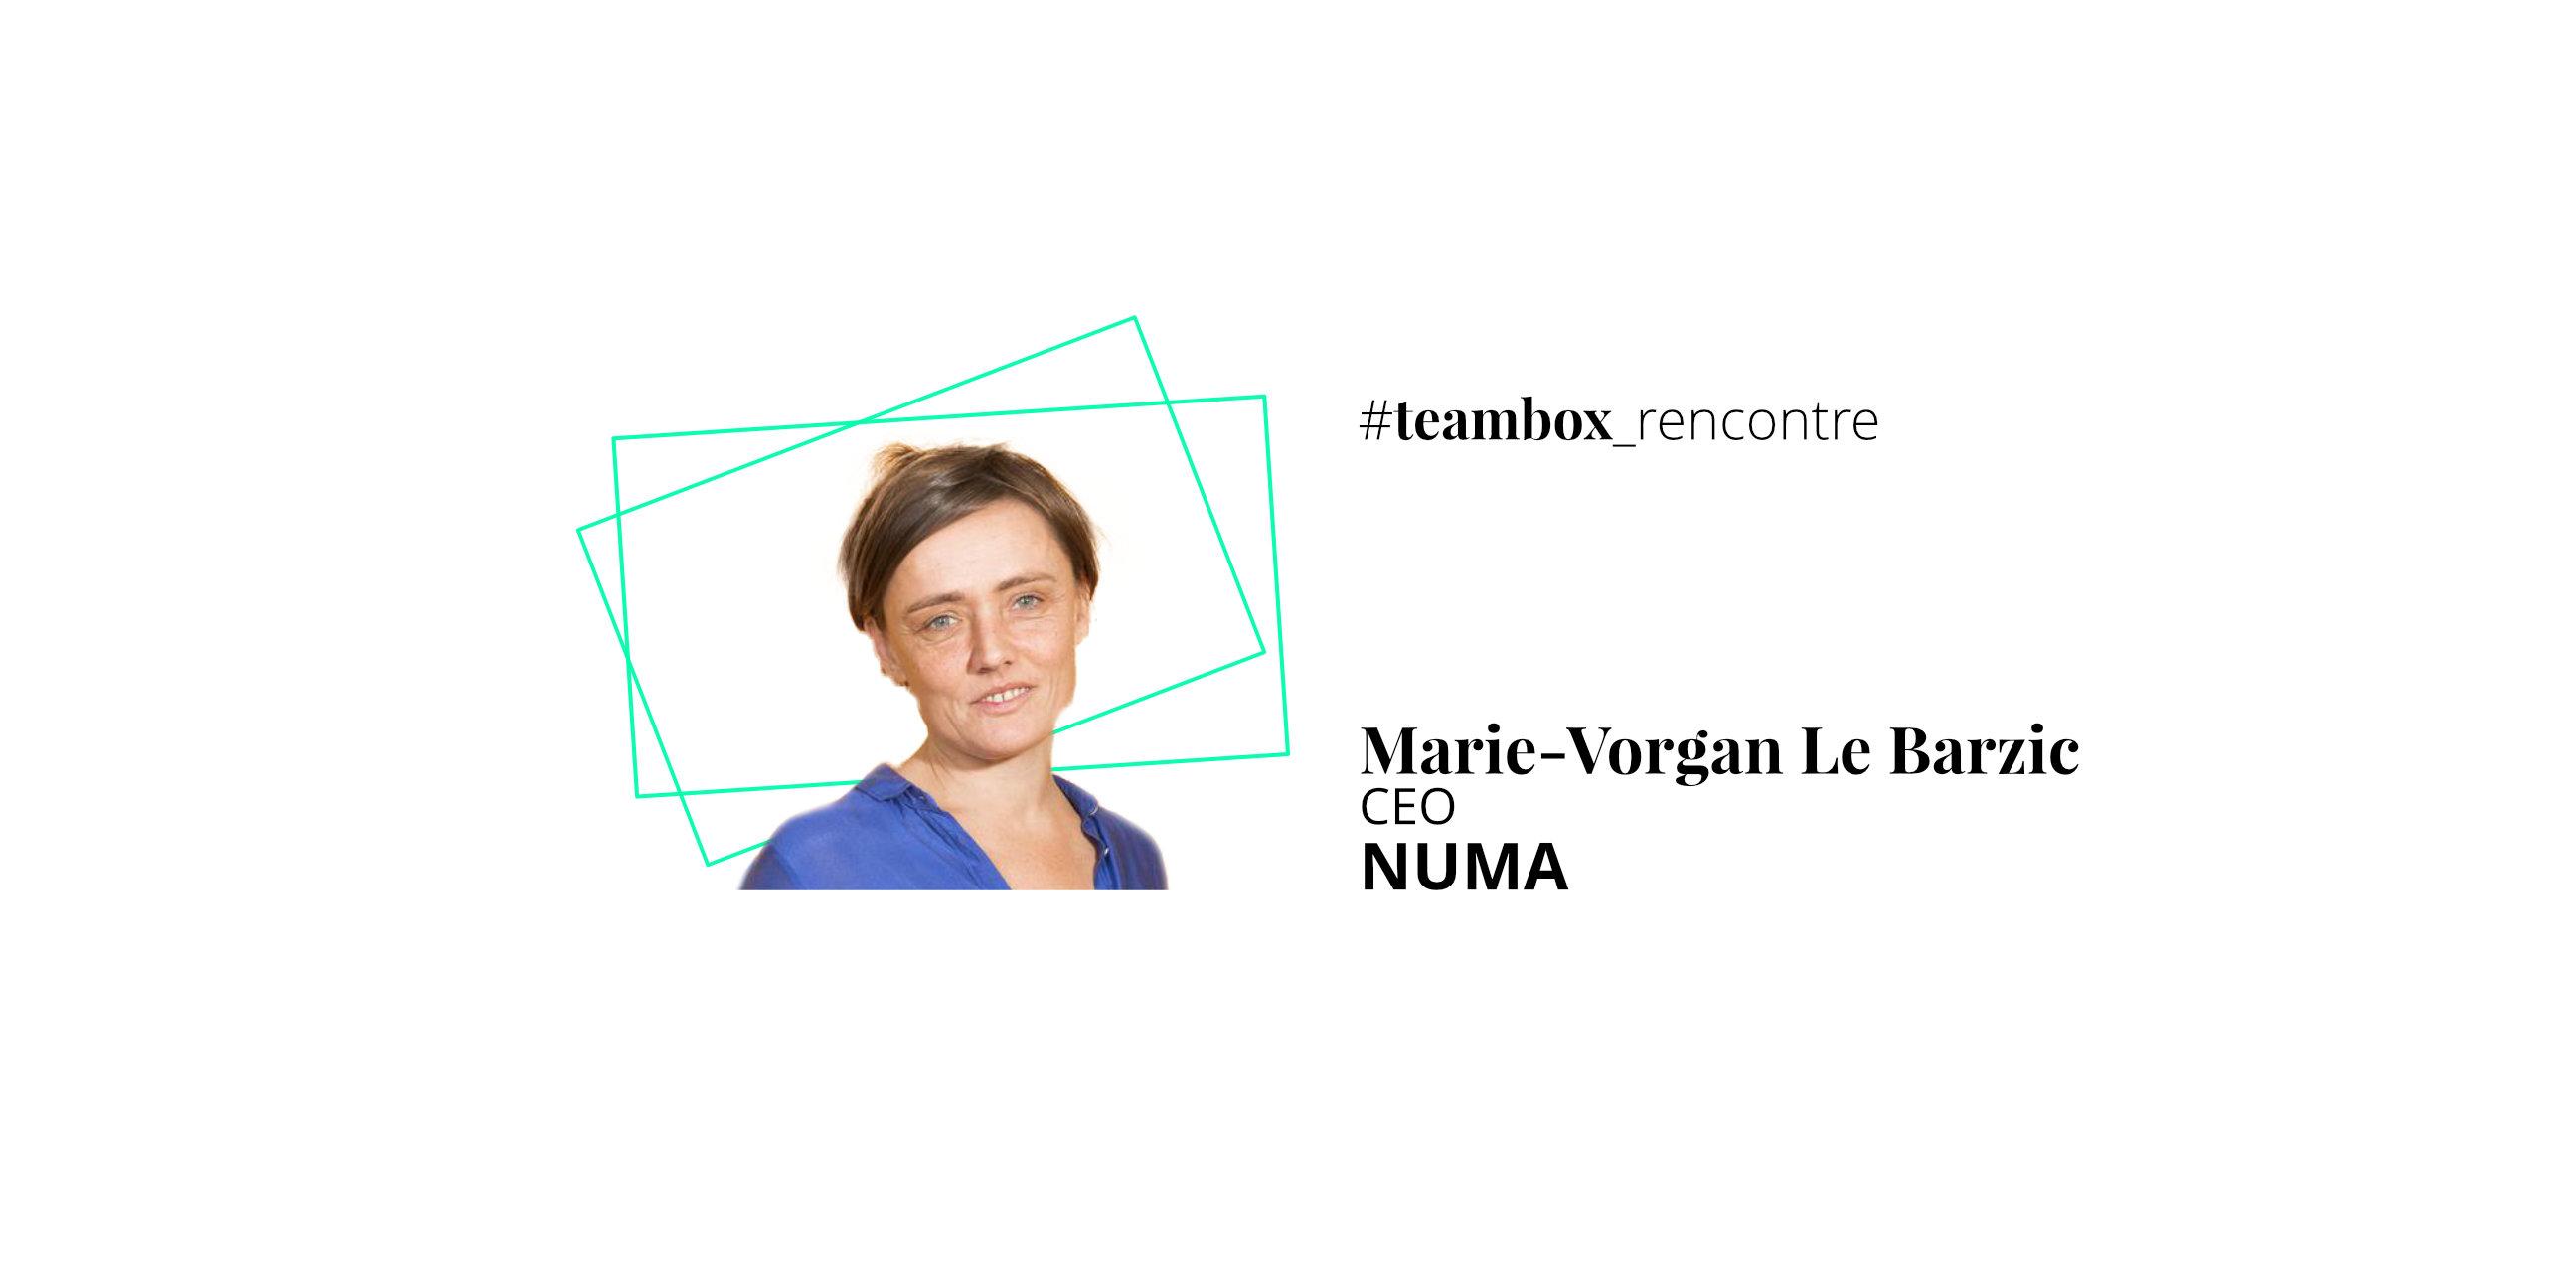 La force de conviction par Marie-Vorgan Le Barzic, CEO de NUMA